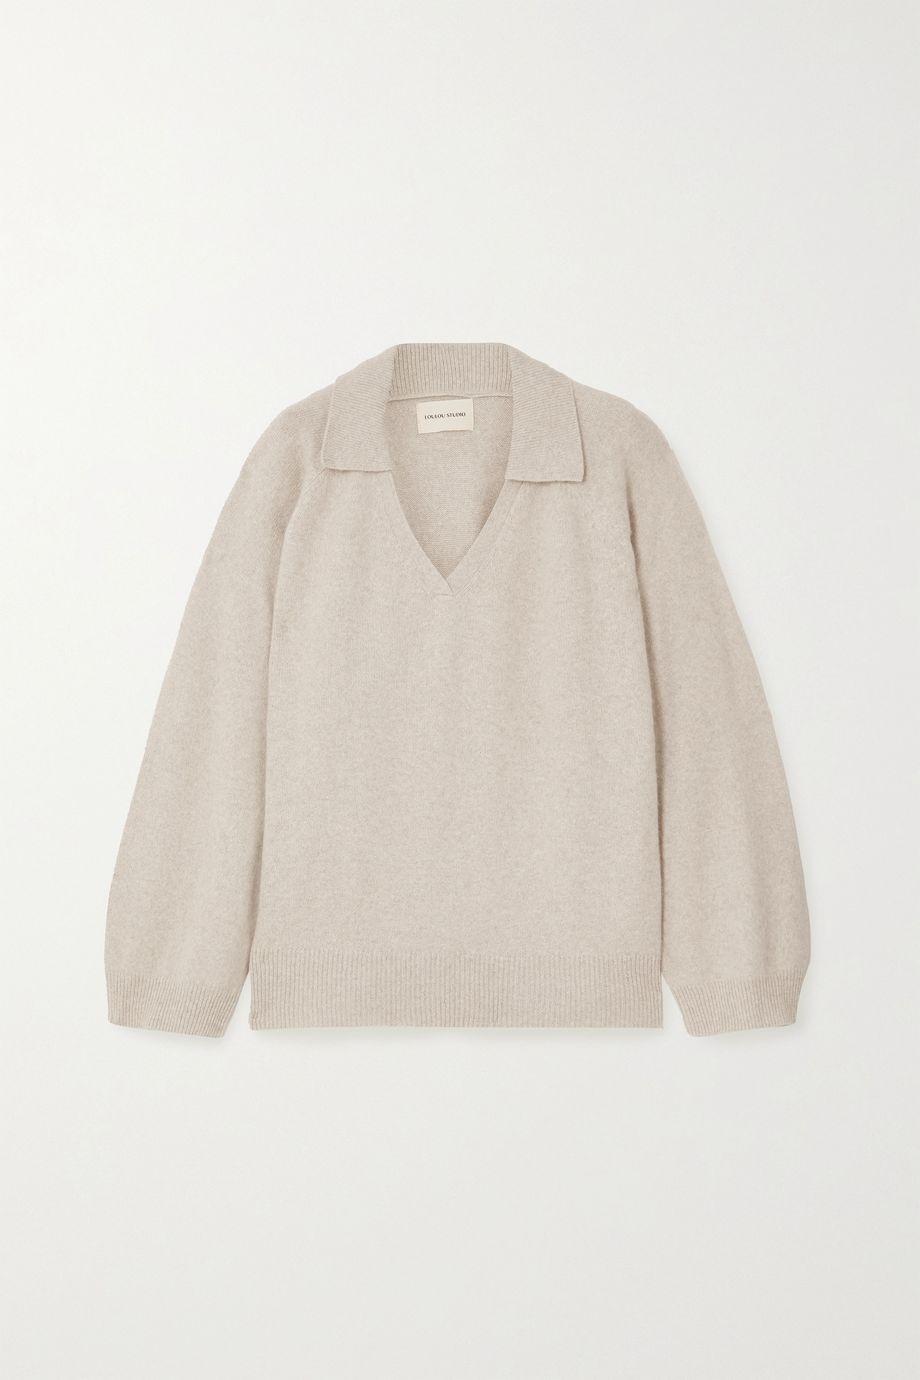 LOULOU STUDIO Sperone wool-blend sweater